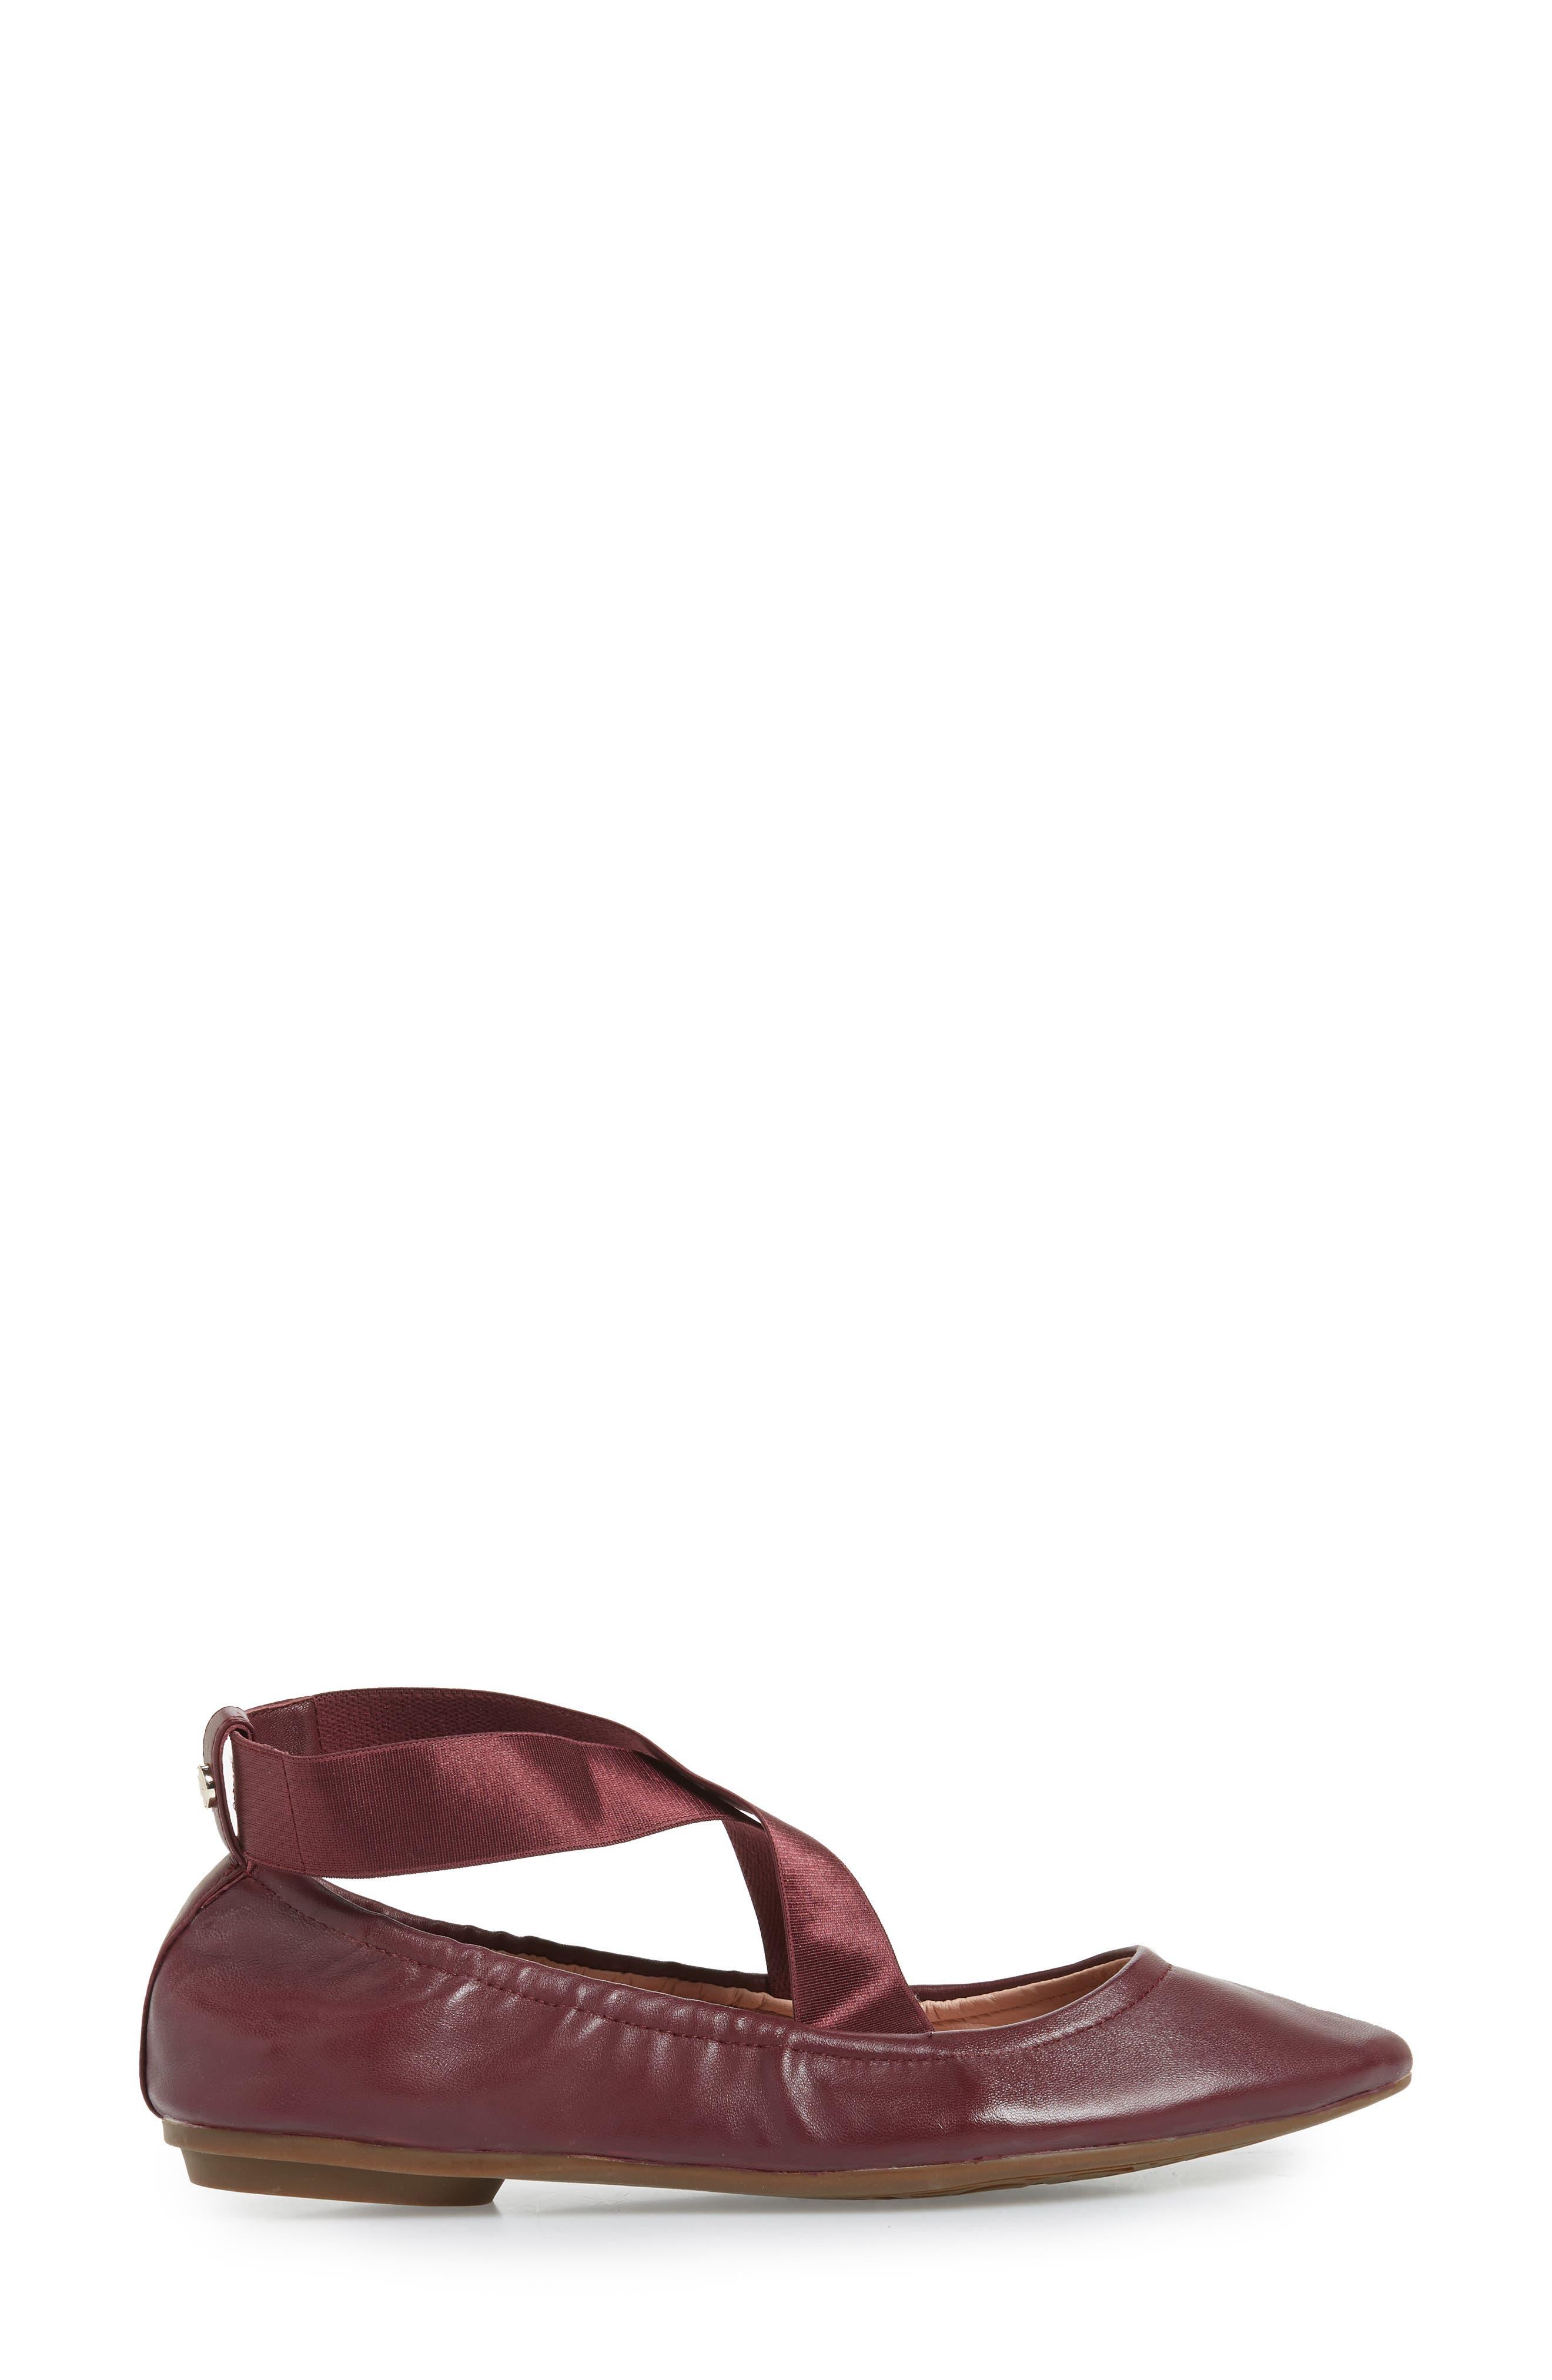 Edina Strappy Ballet Flat,                             Alternate thumbnail 15, color,